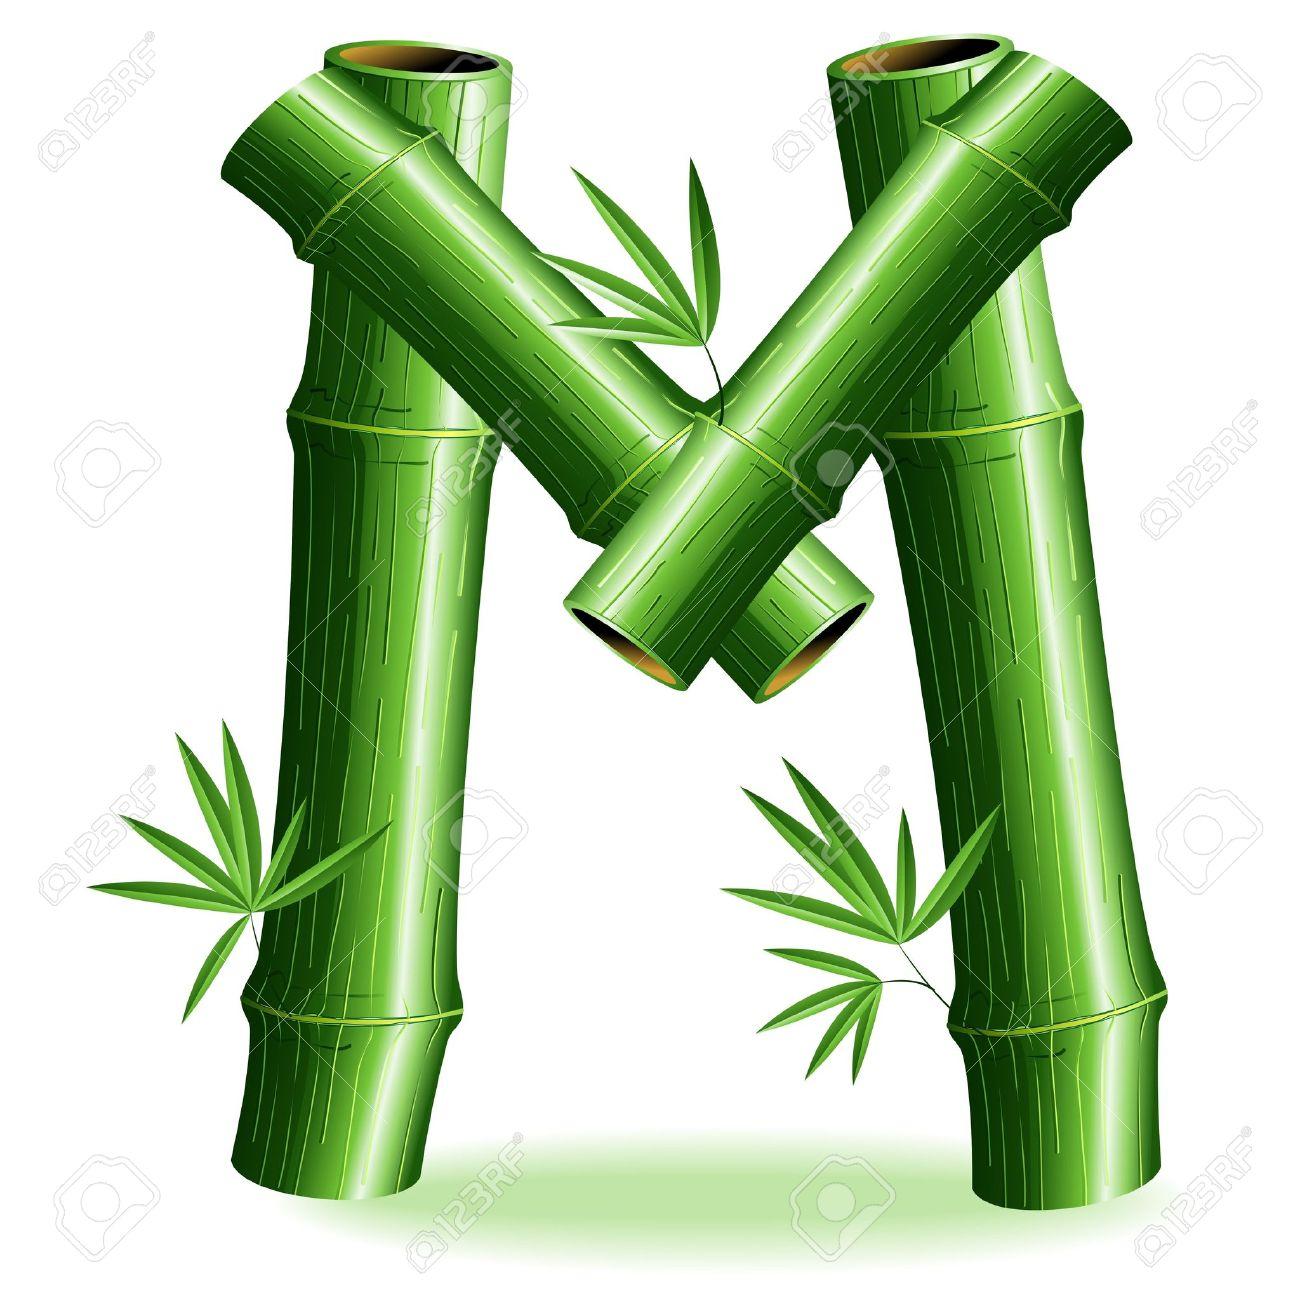 Green Letter m Logo Green Letter m Logos Letter m